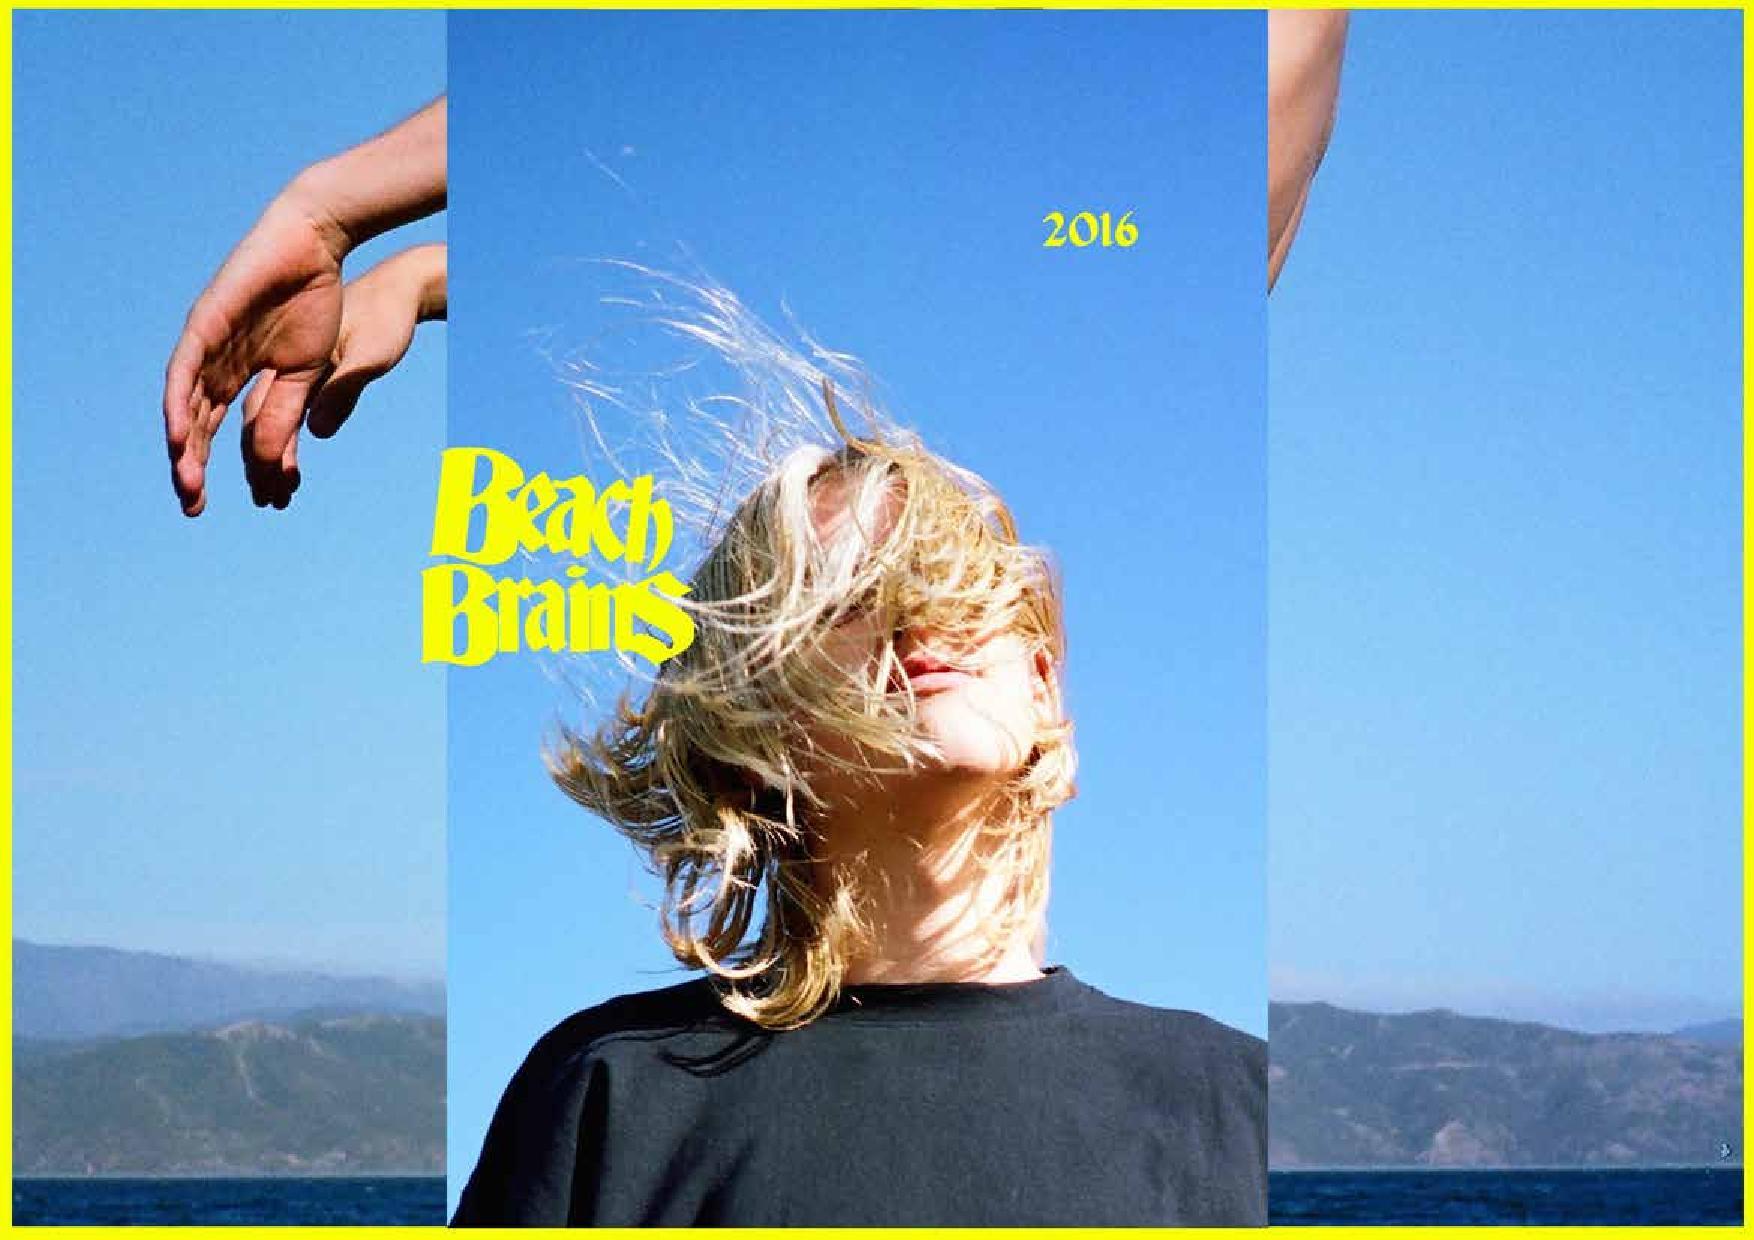 BeachBrains-page-001